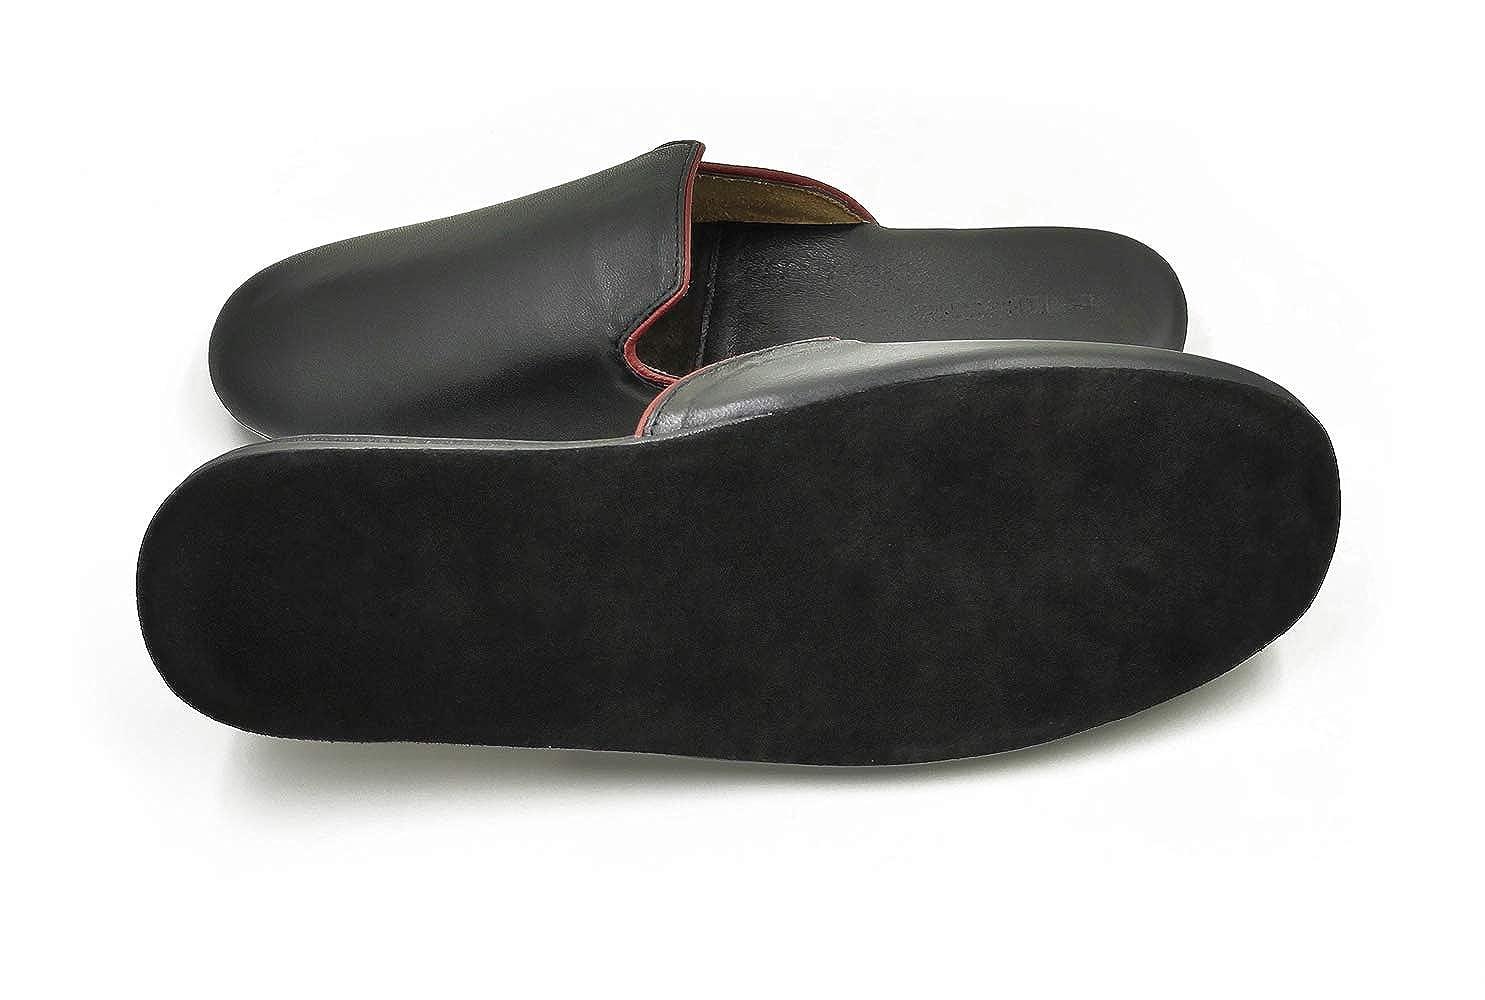 YOXI Soft Genuine Sheepskin Leather Slippers Mens Womens Lovers House Slip on Shoes